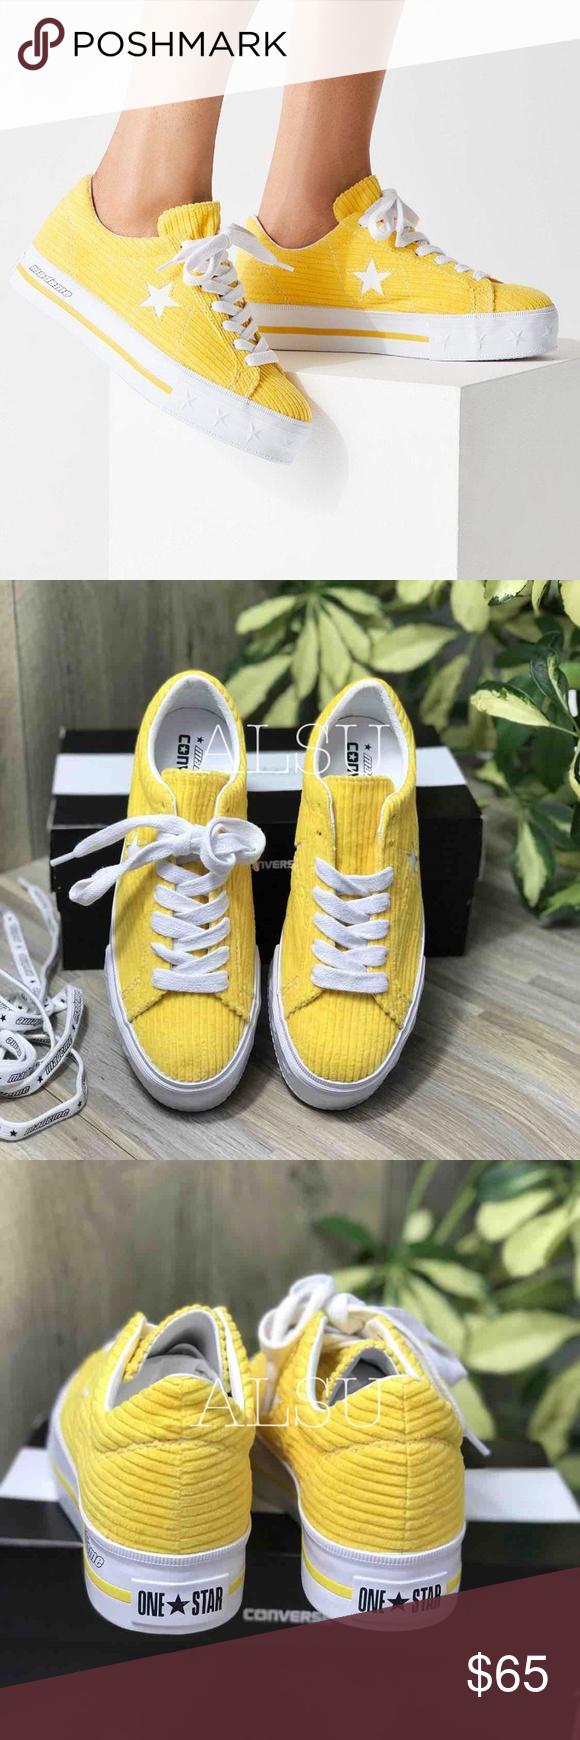 NWT Converse One Star Platform Ox Vibrant Yellow Brand new